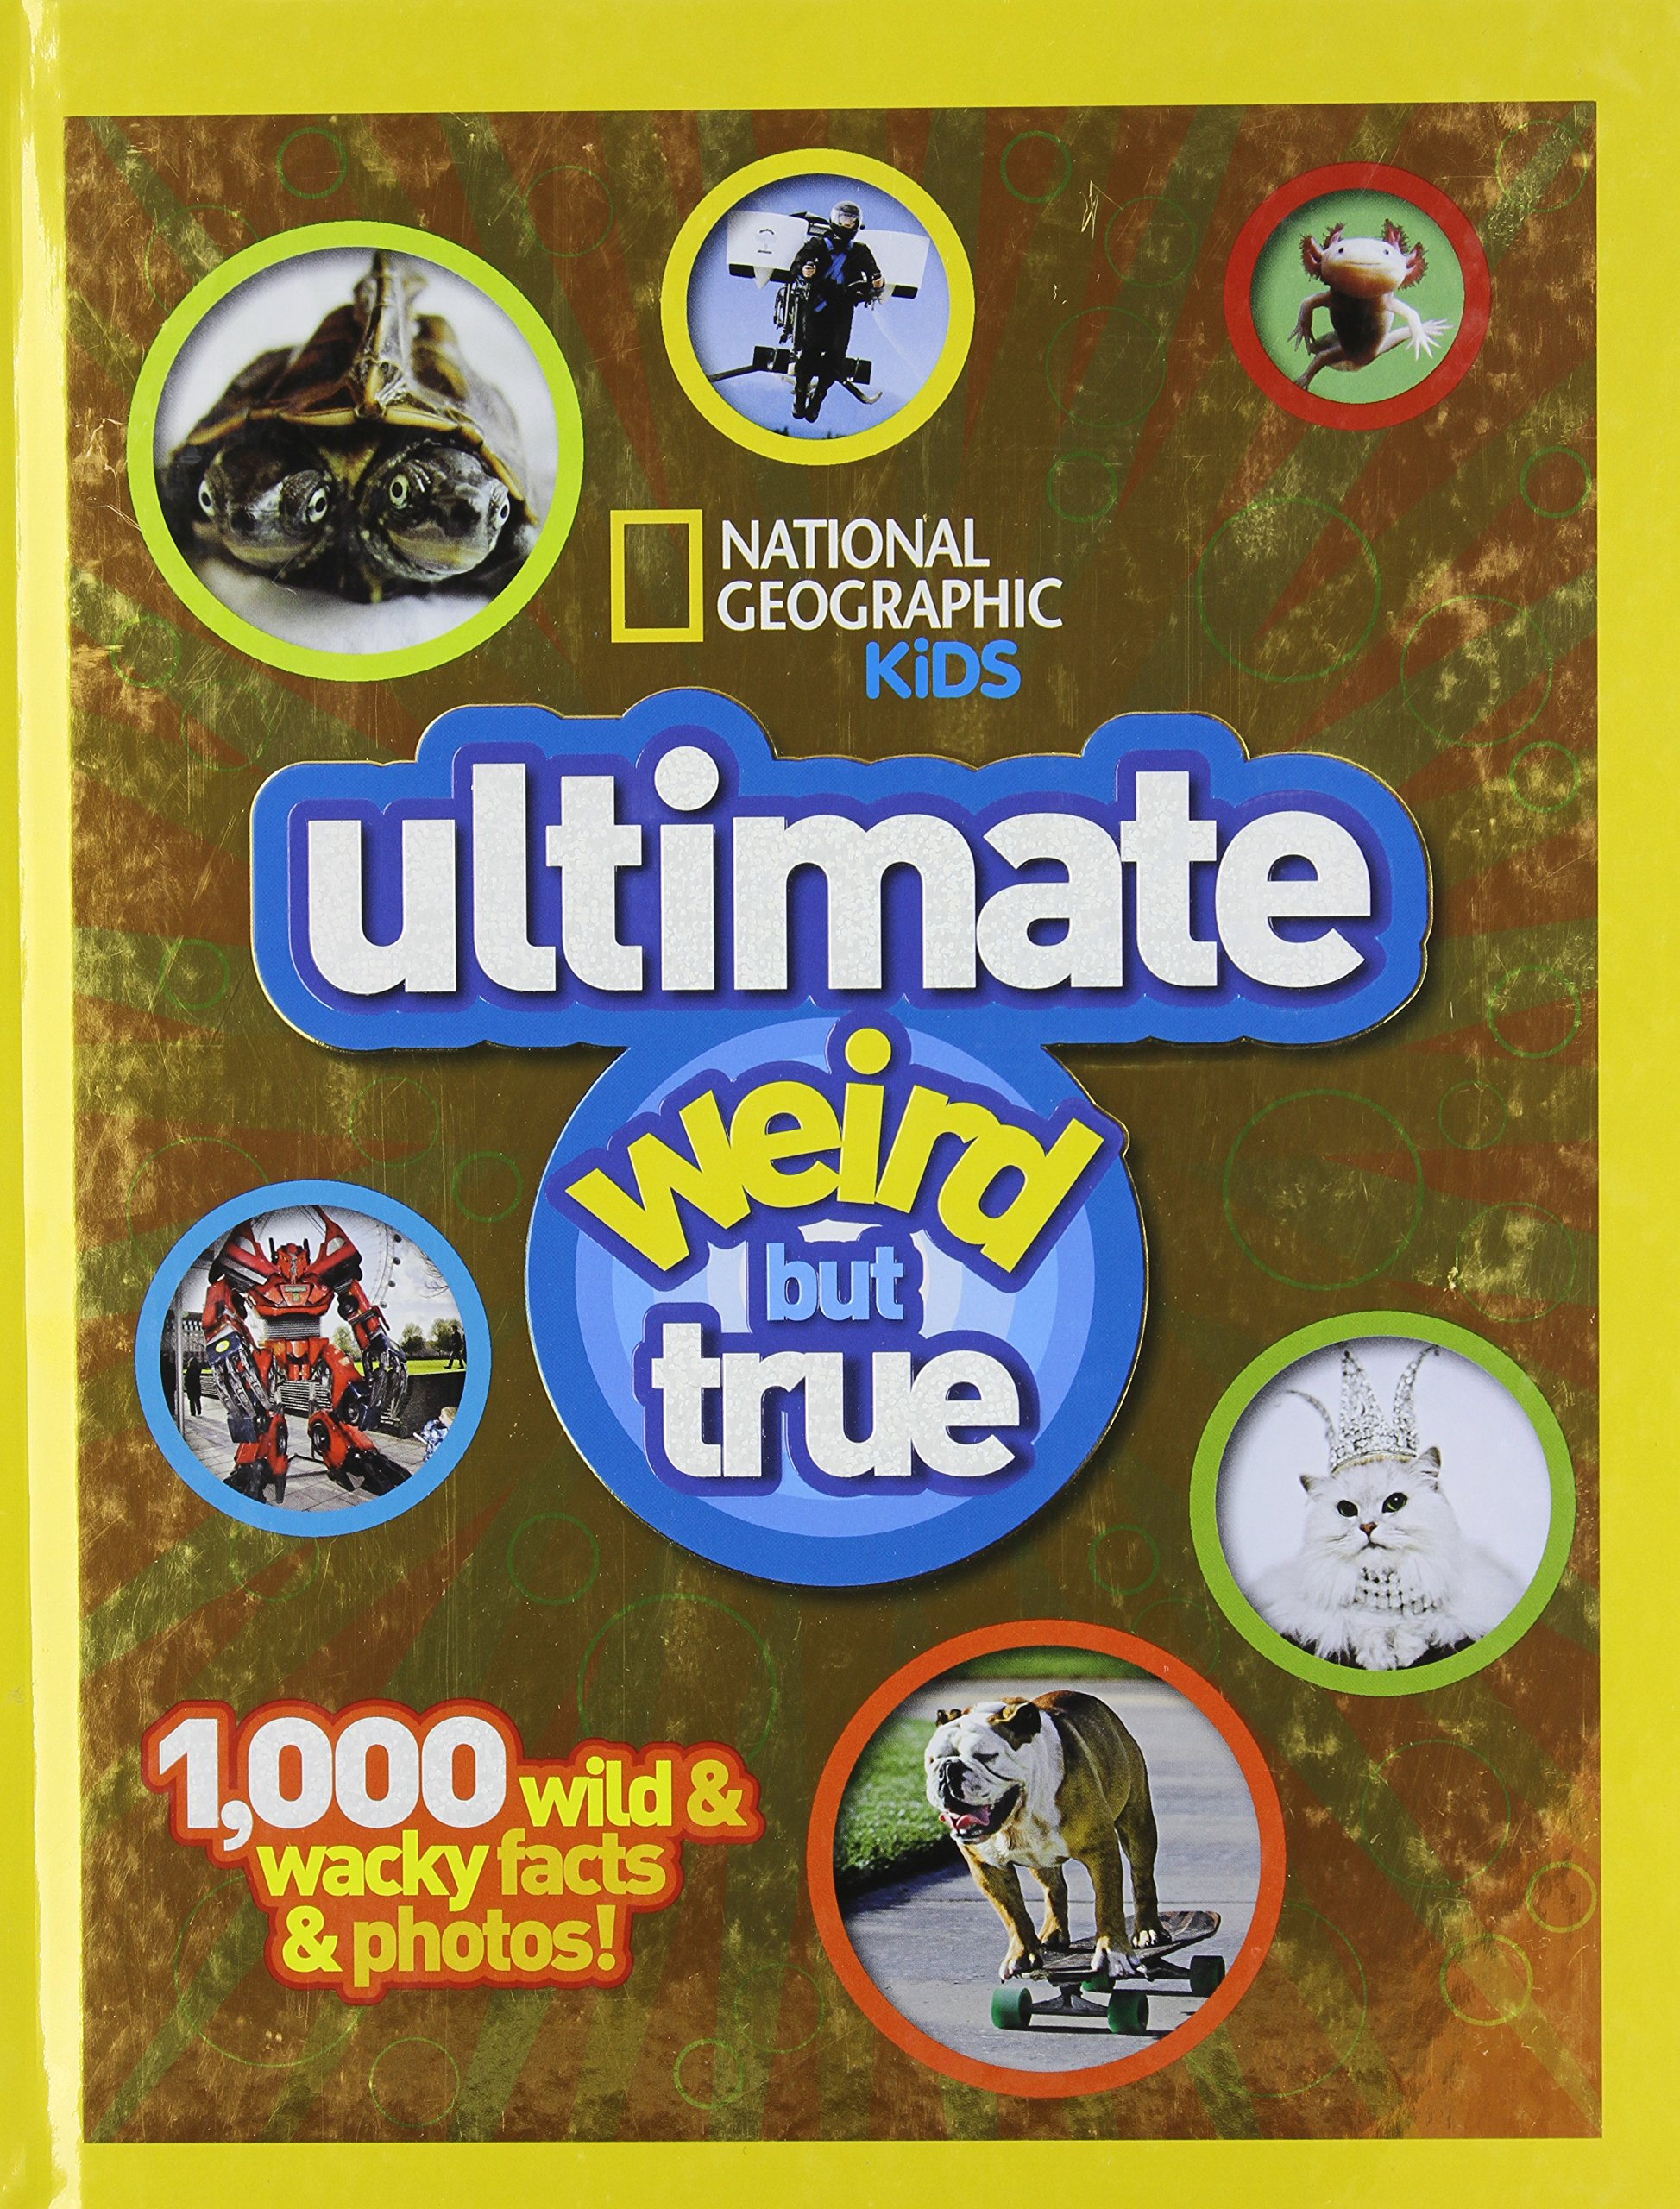 NG Kids Ultimate Weird but True: 1,000 Wild & Wacky Facts and Photos (National Geographic Kids Weird But True)